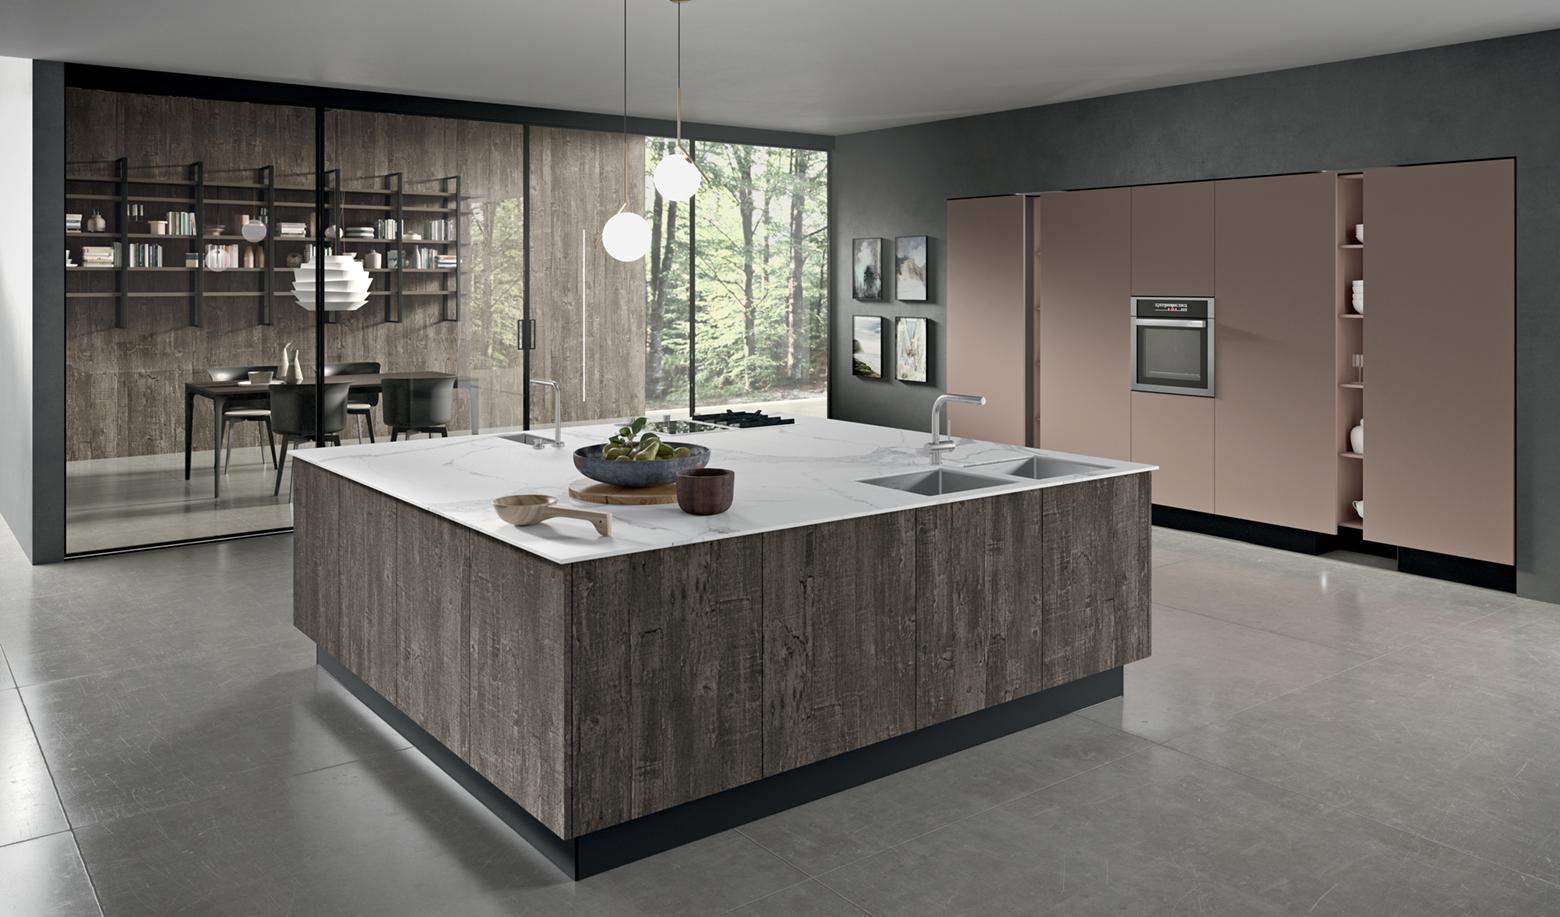 Modern Kitchen Cabinets Penelope European Cabinets Design